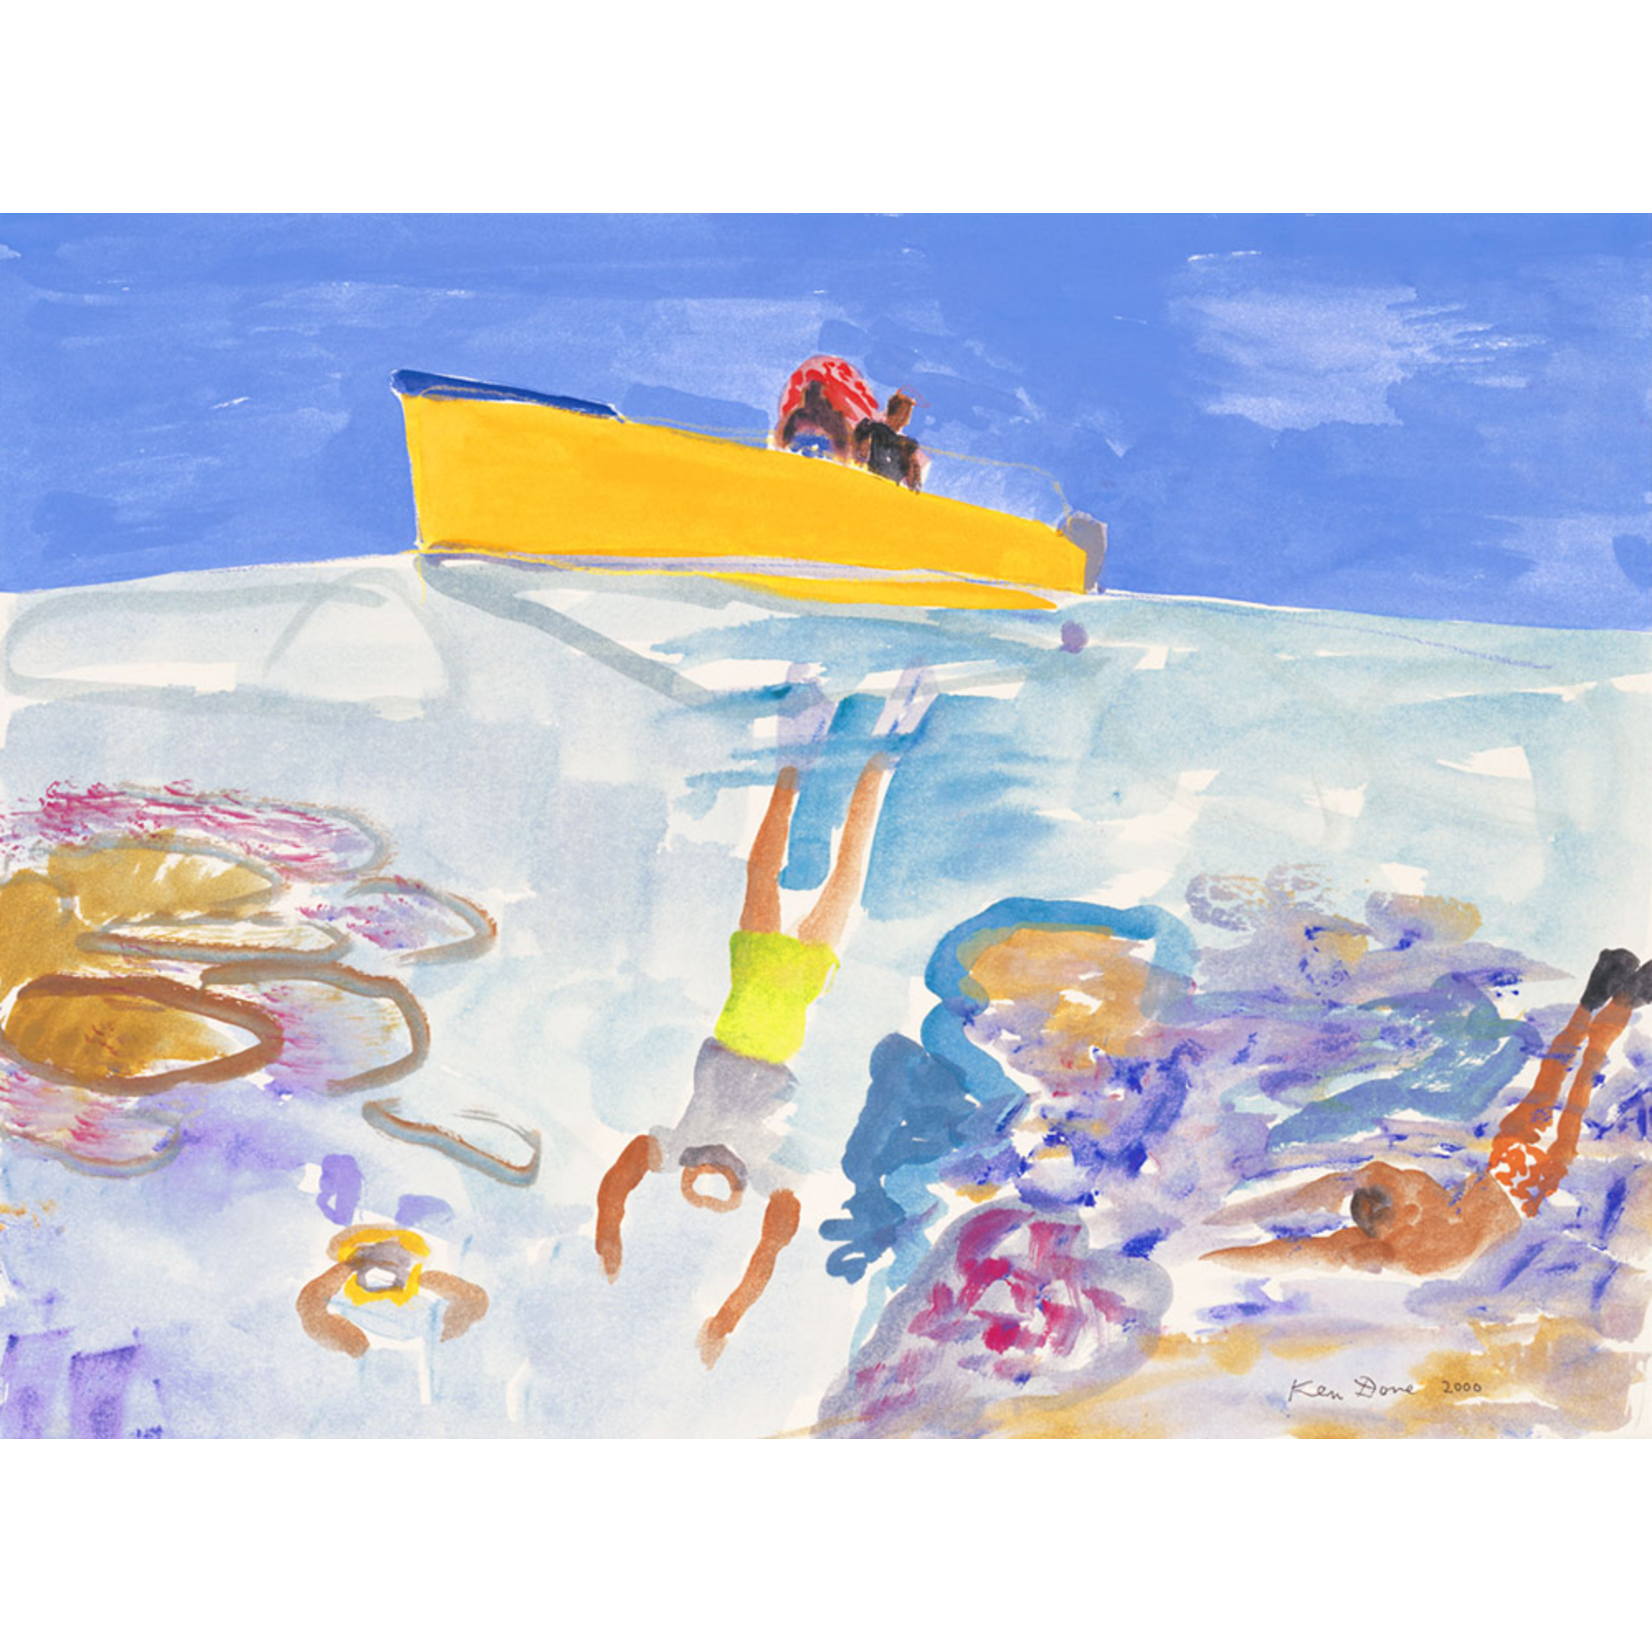 Limited Edition Prints Diving Toberua Island, 2000